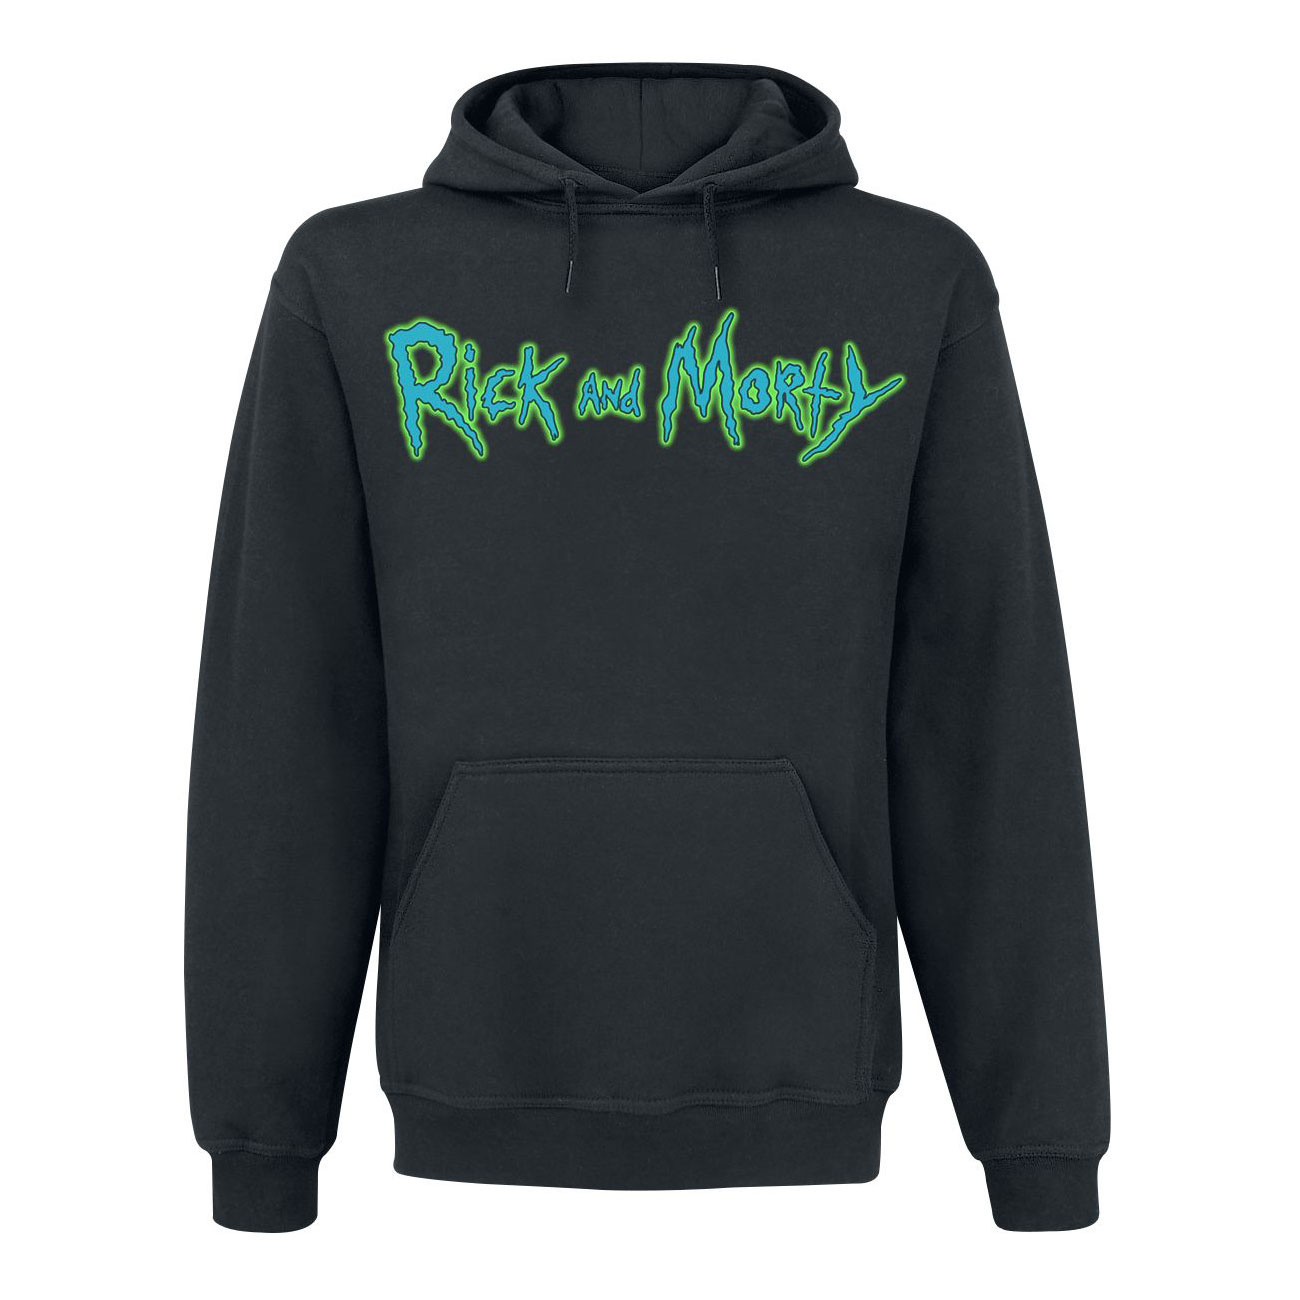 cb027689f54d Μπλούζα φούτερ με κουκούλα Rick and Morty-Riggity Riggity μαύρη size ...